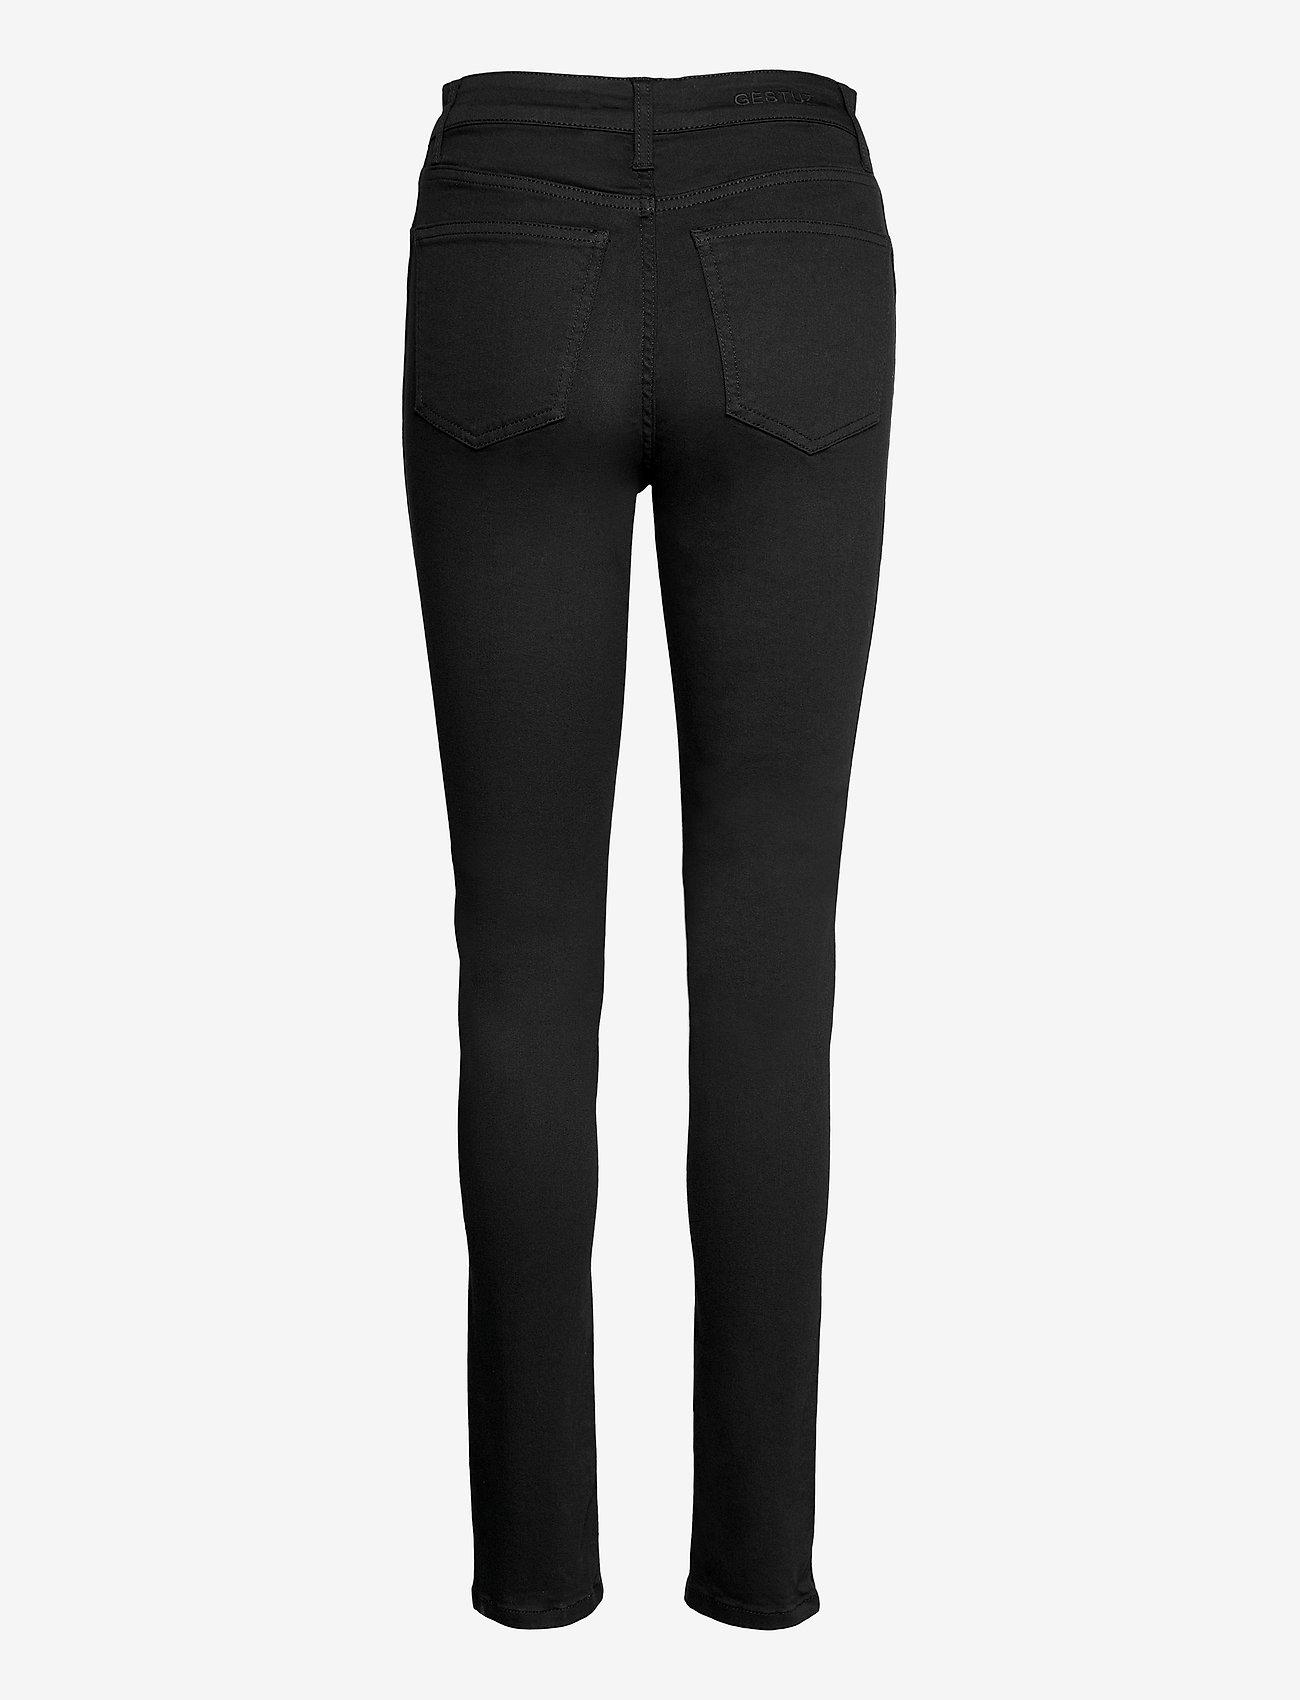 Gestuz - EmilyGZ HW skinny jeans black - skinny jeans - black - 2